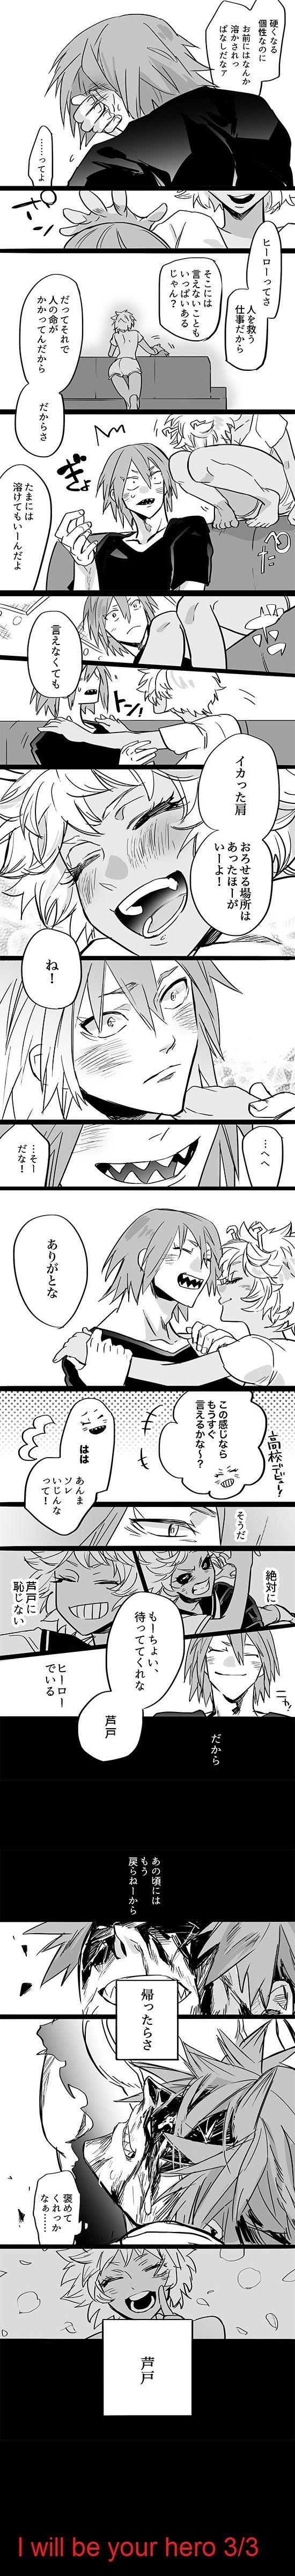 I will be your hero  3/3 Kirishima Eijirou × Ashido Mina